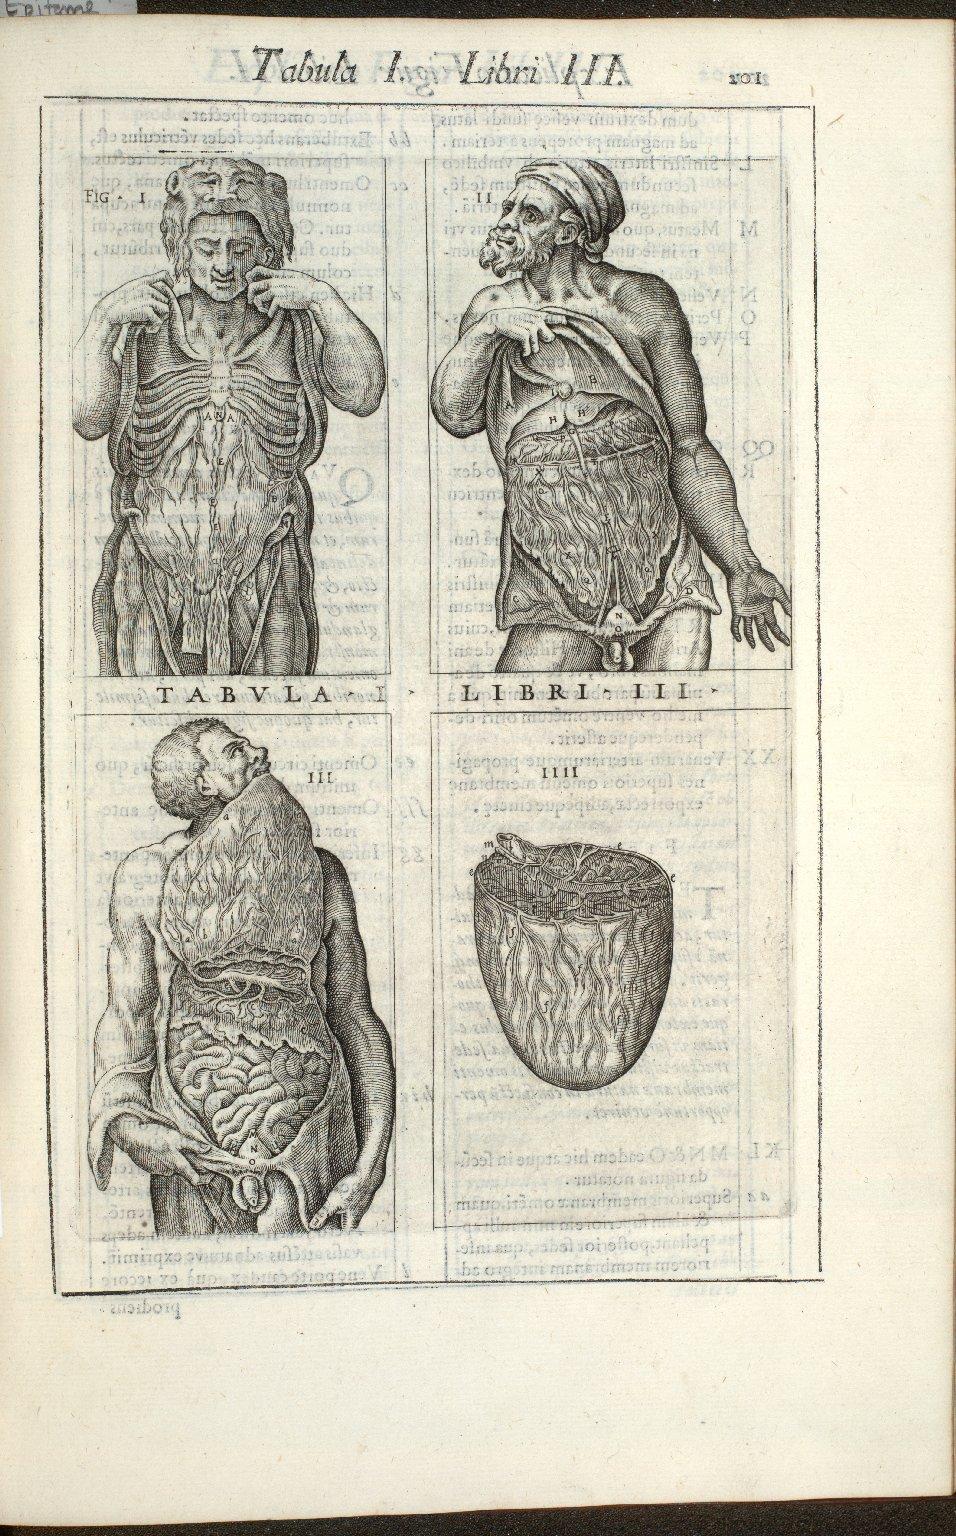 Tabula I. Libri III.